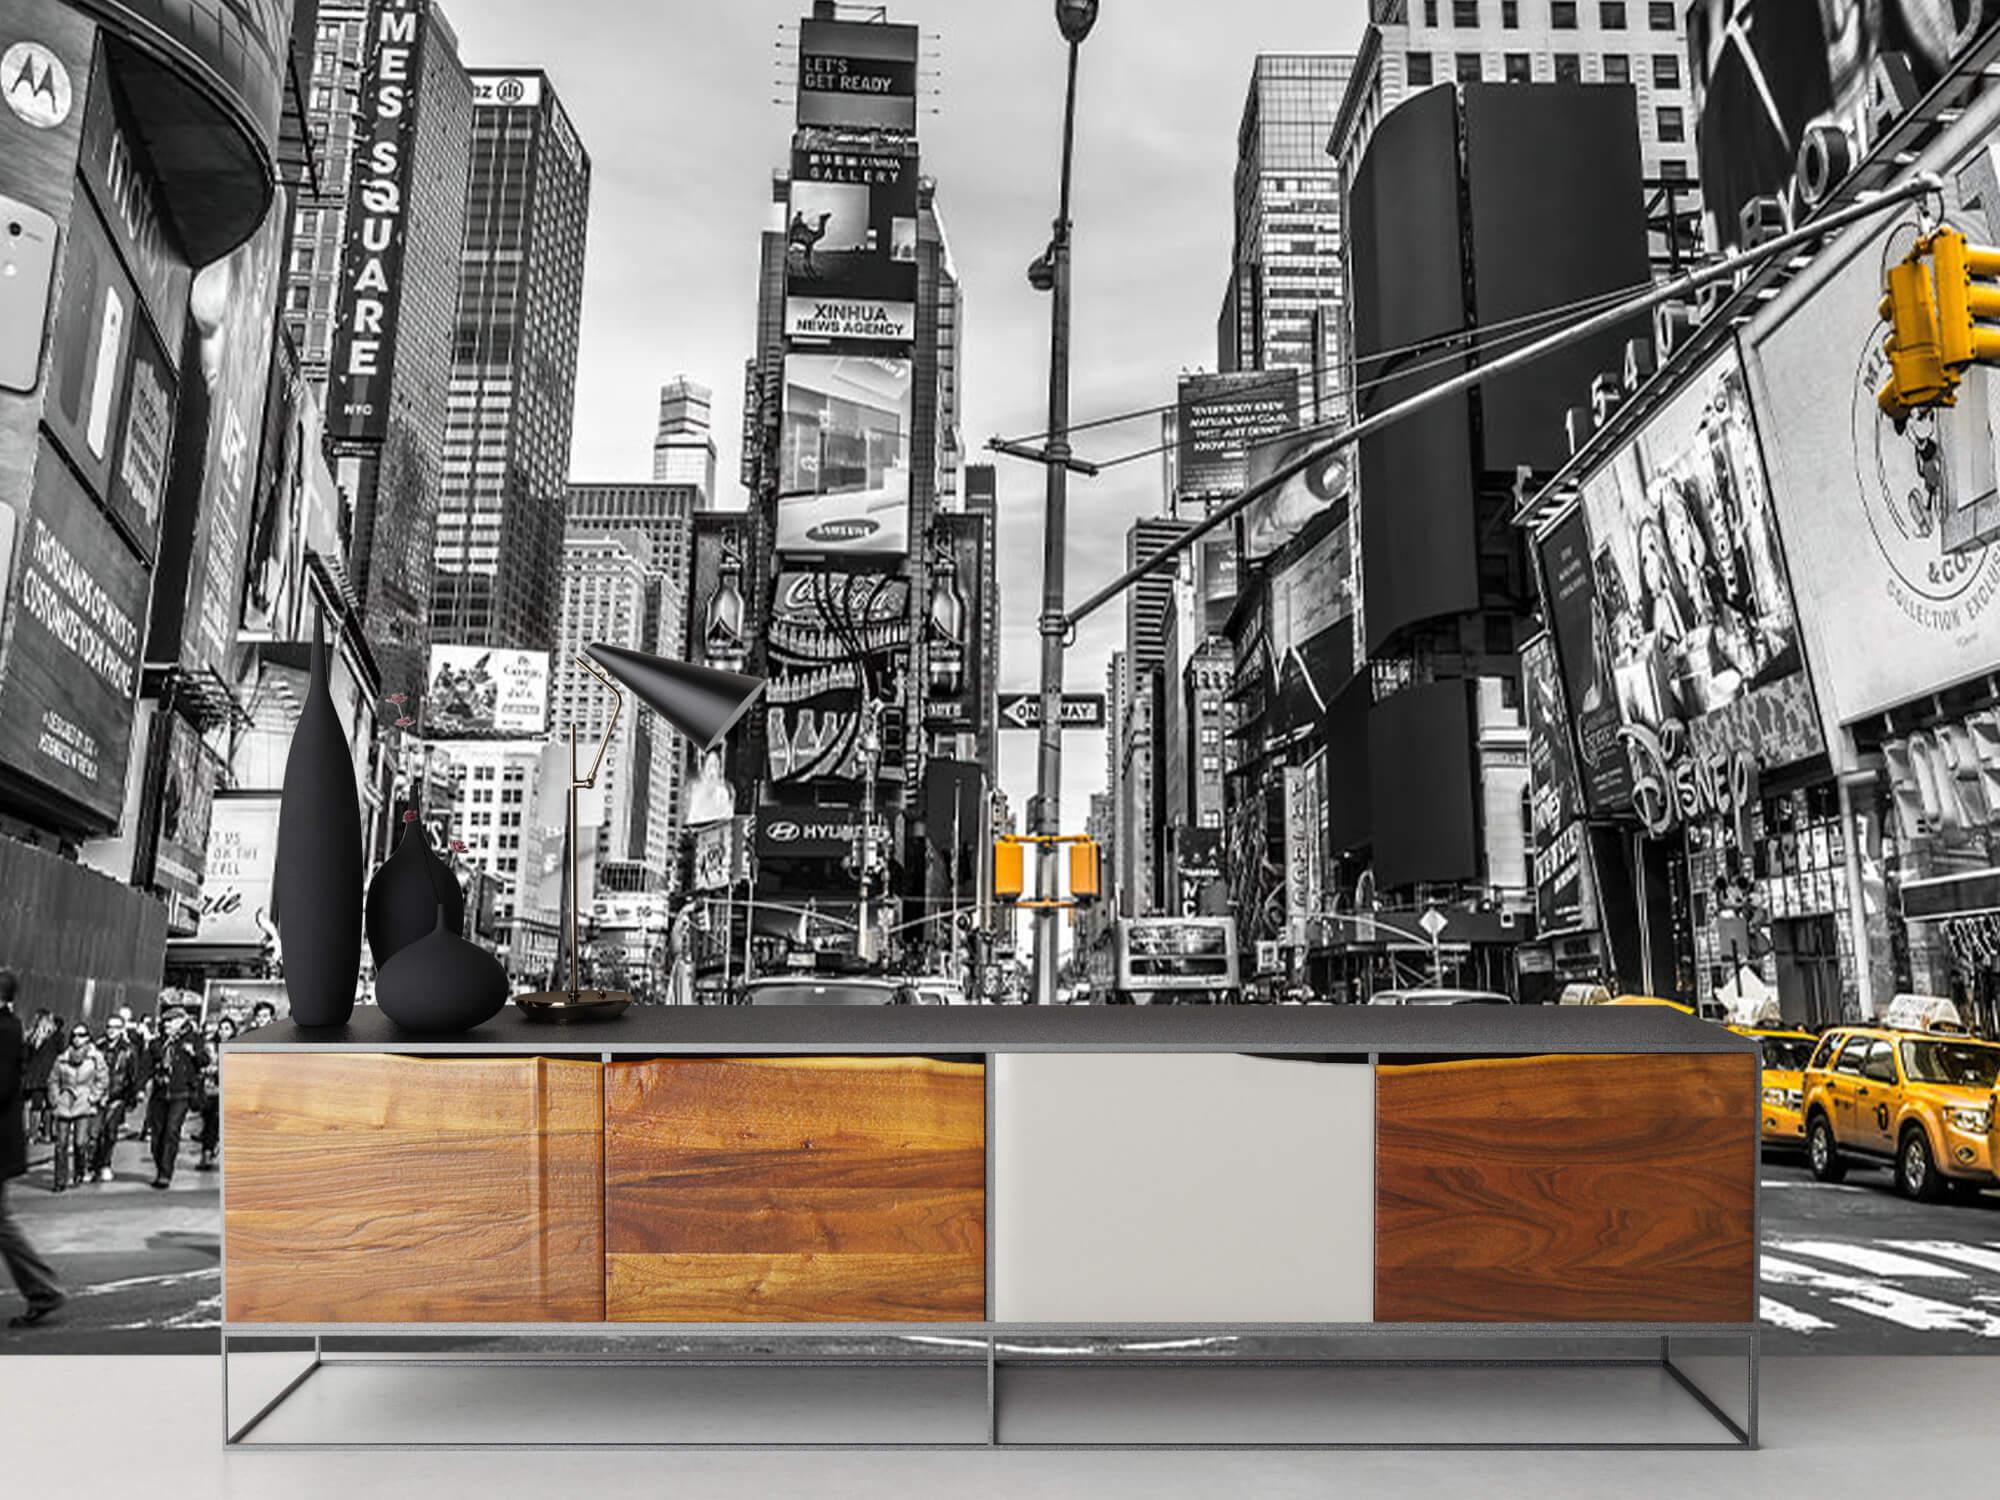 Broadway Times Square 13